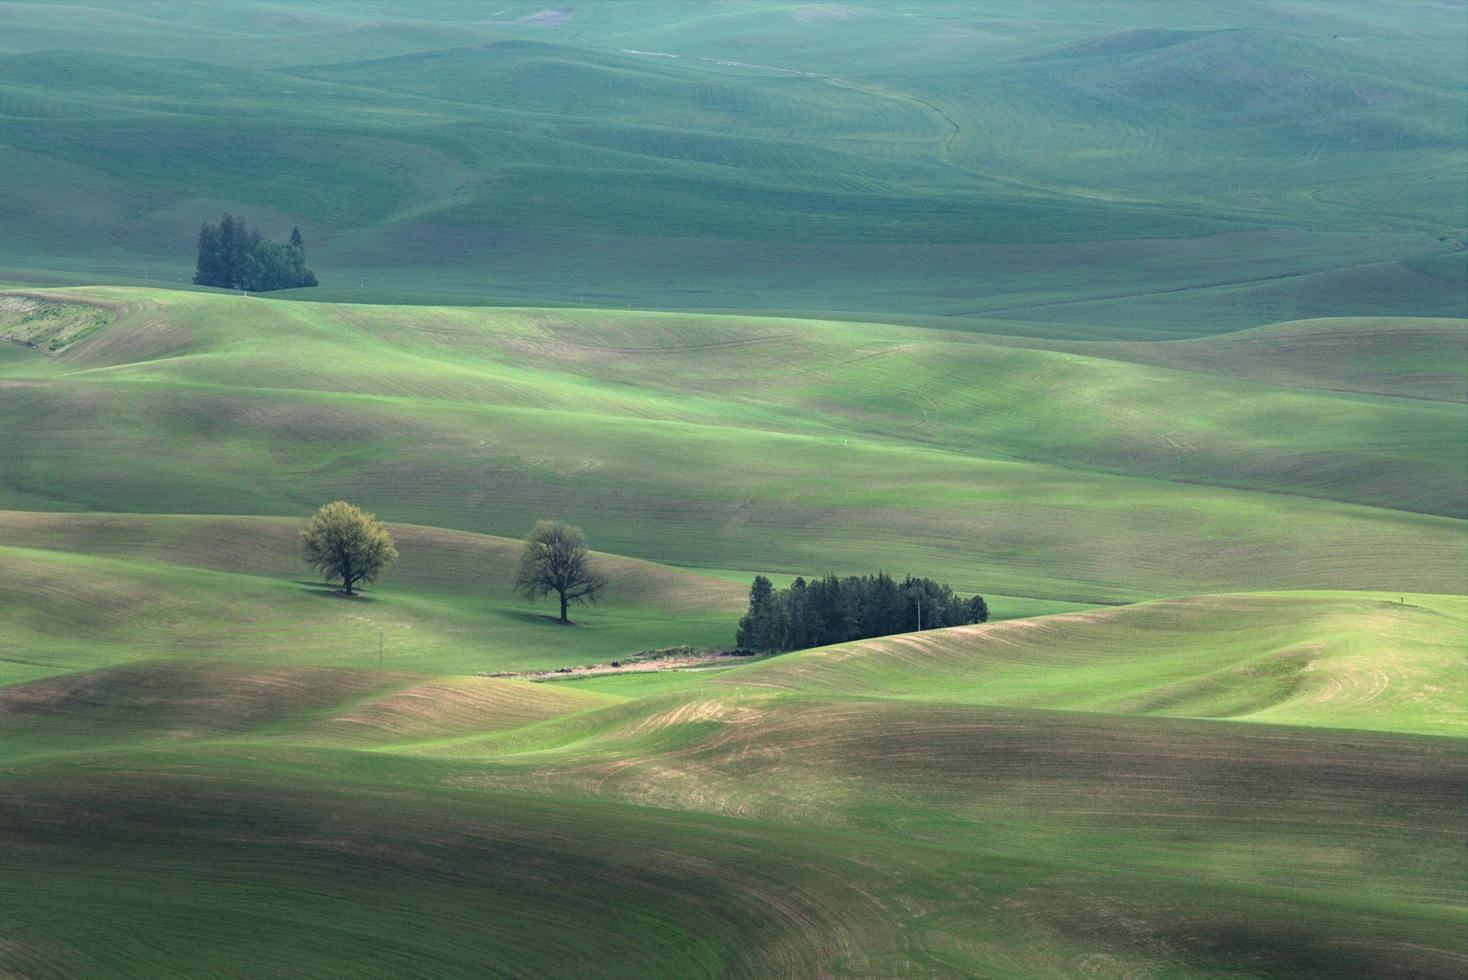 photo de champ d'herbe verte